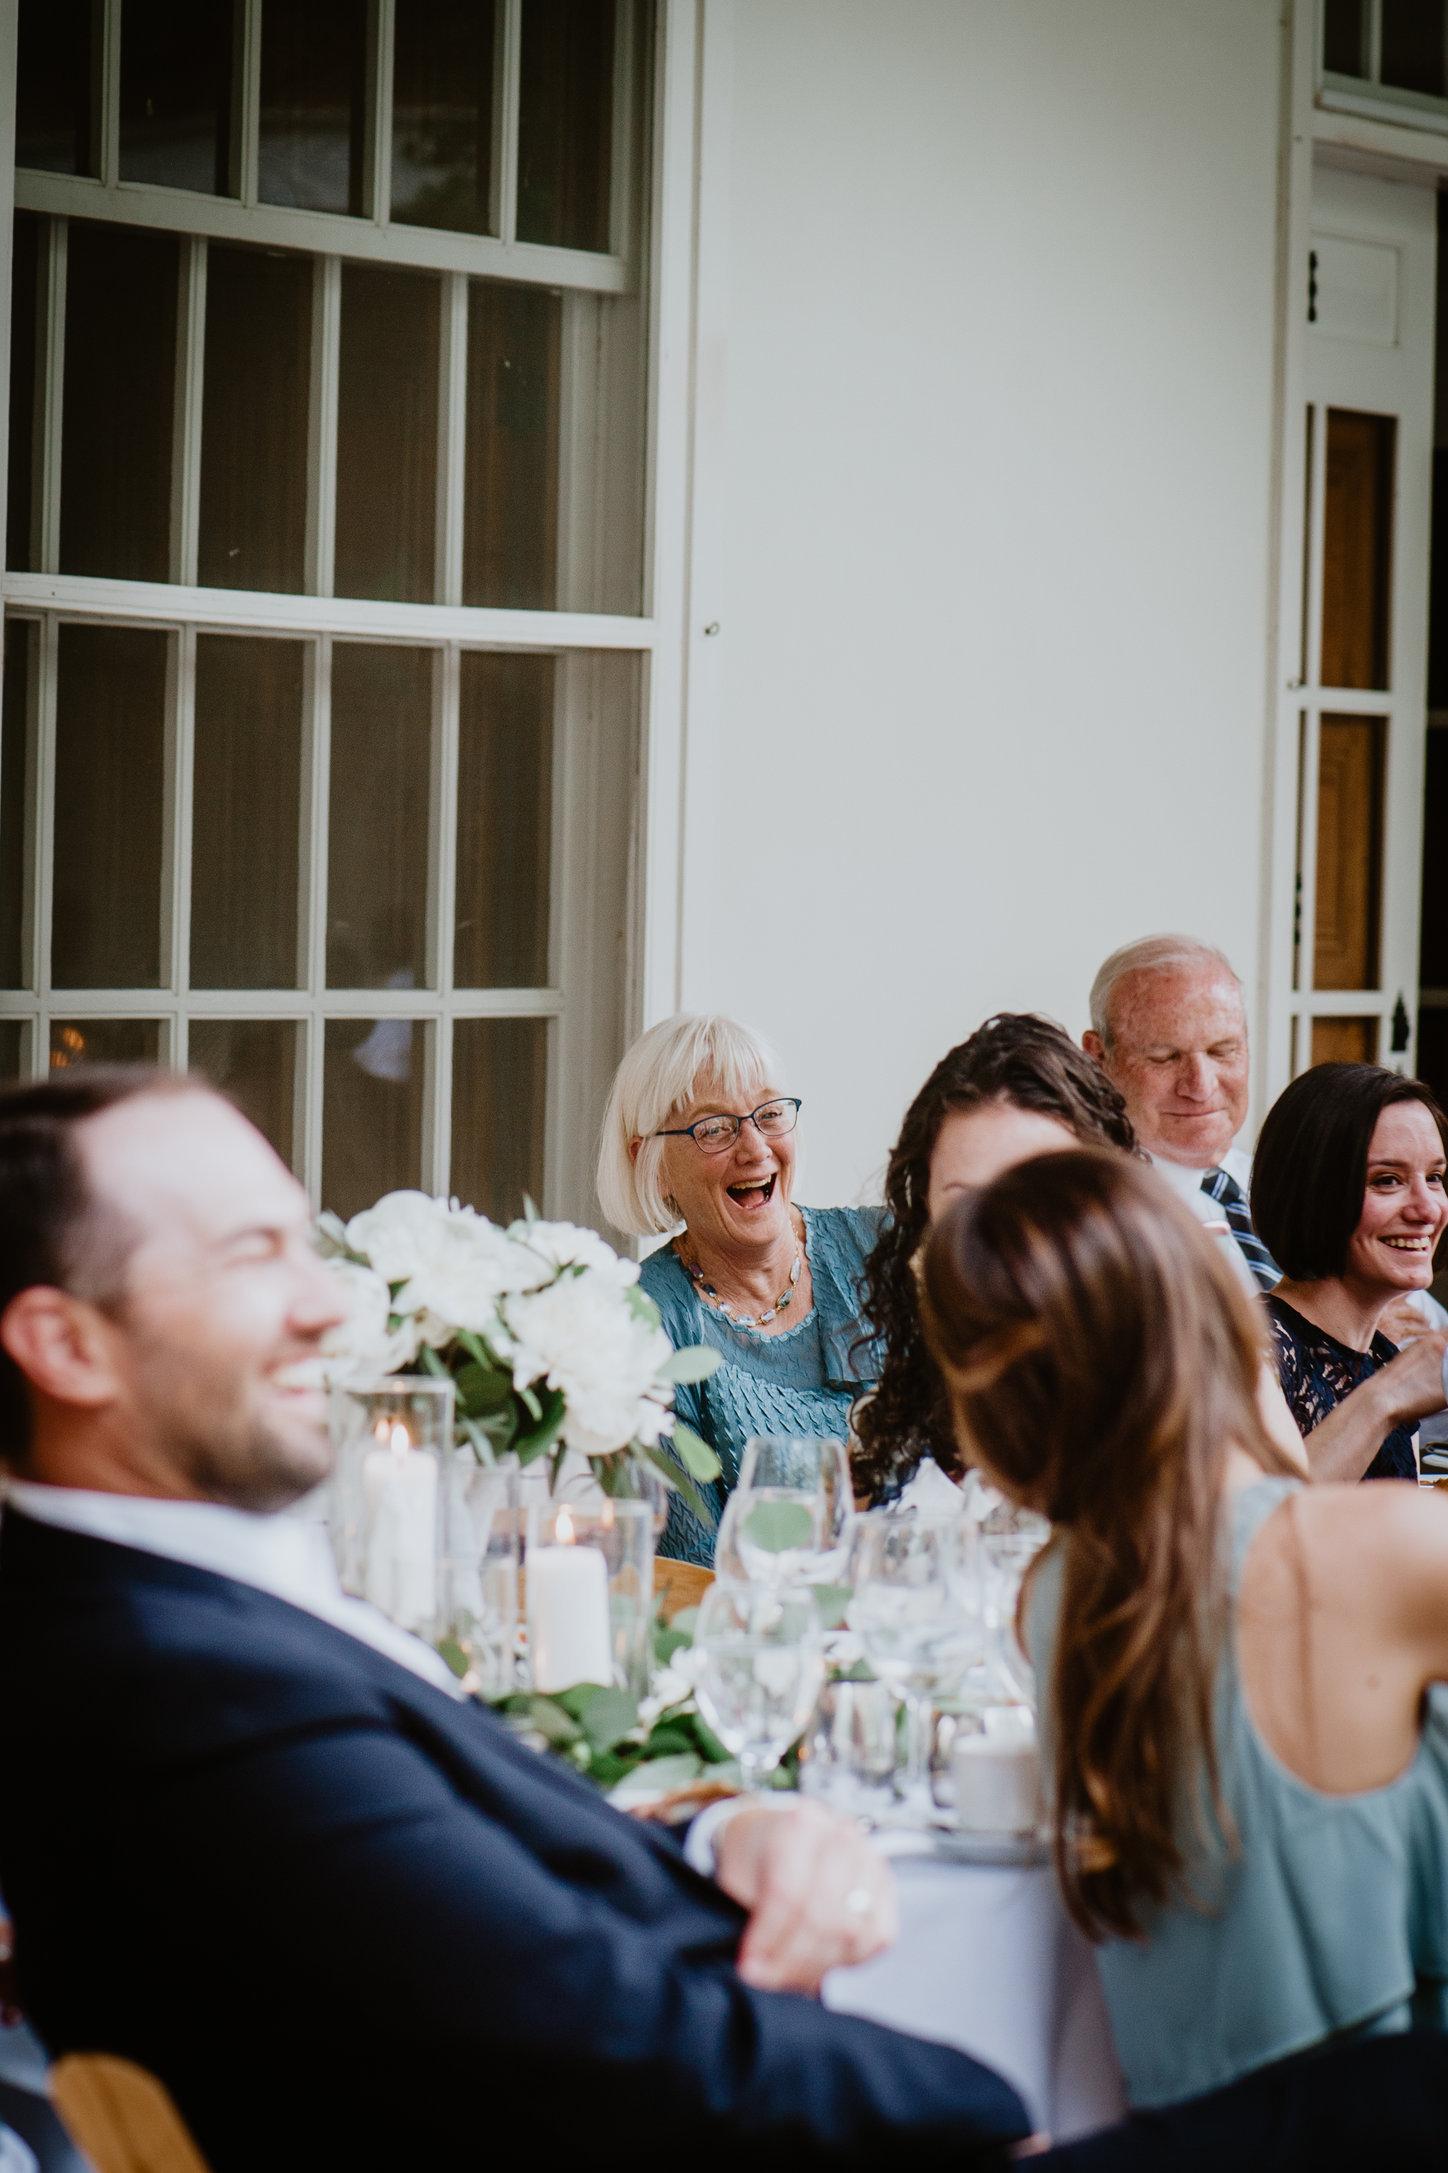 DandA-wedding-684.jpg